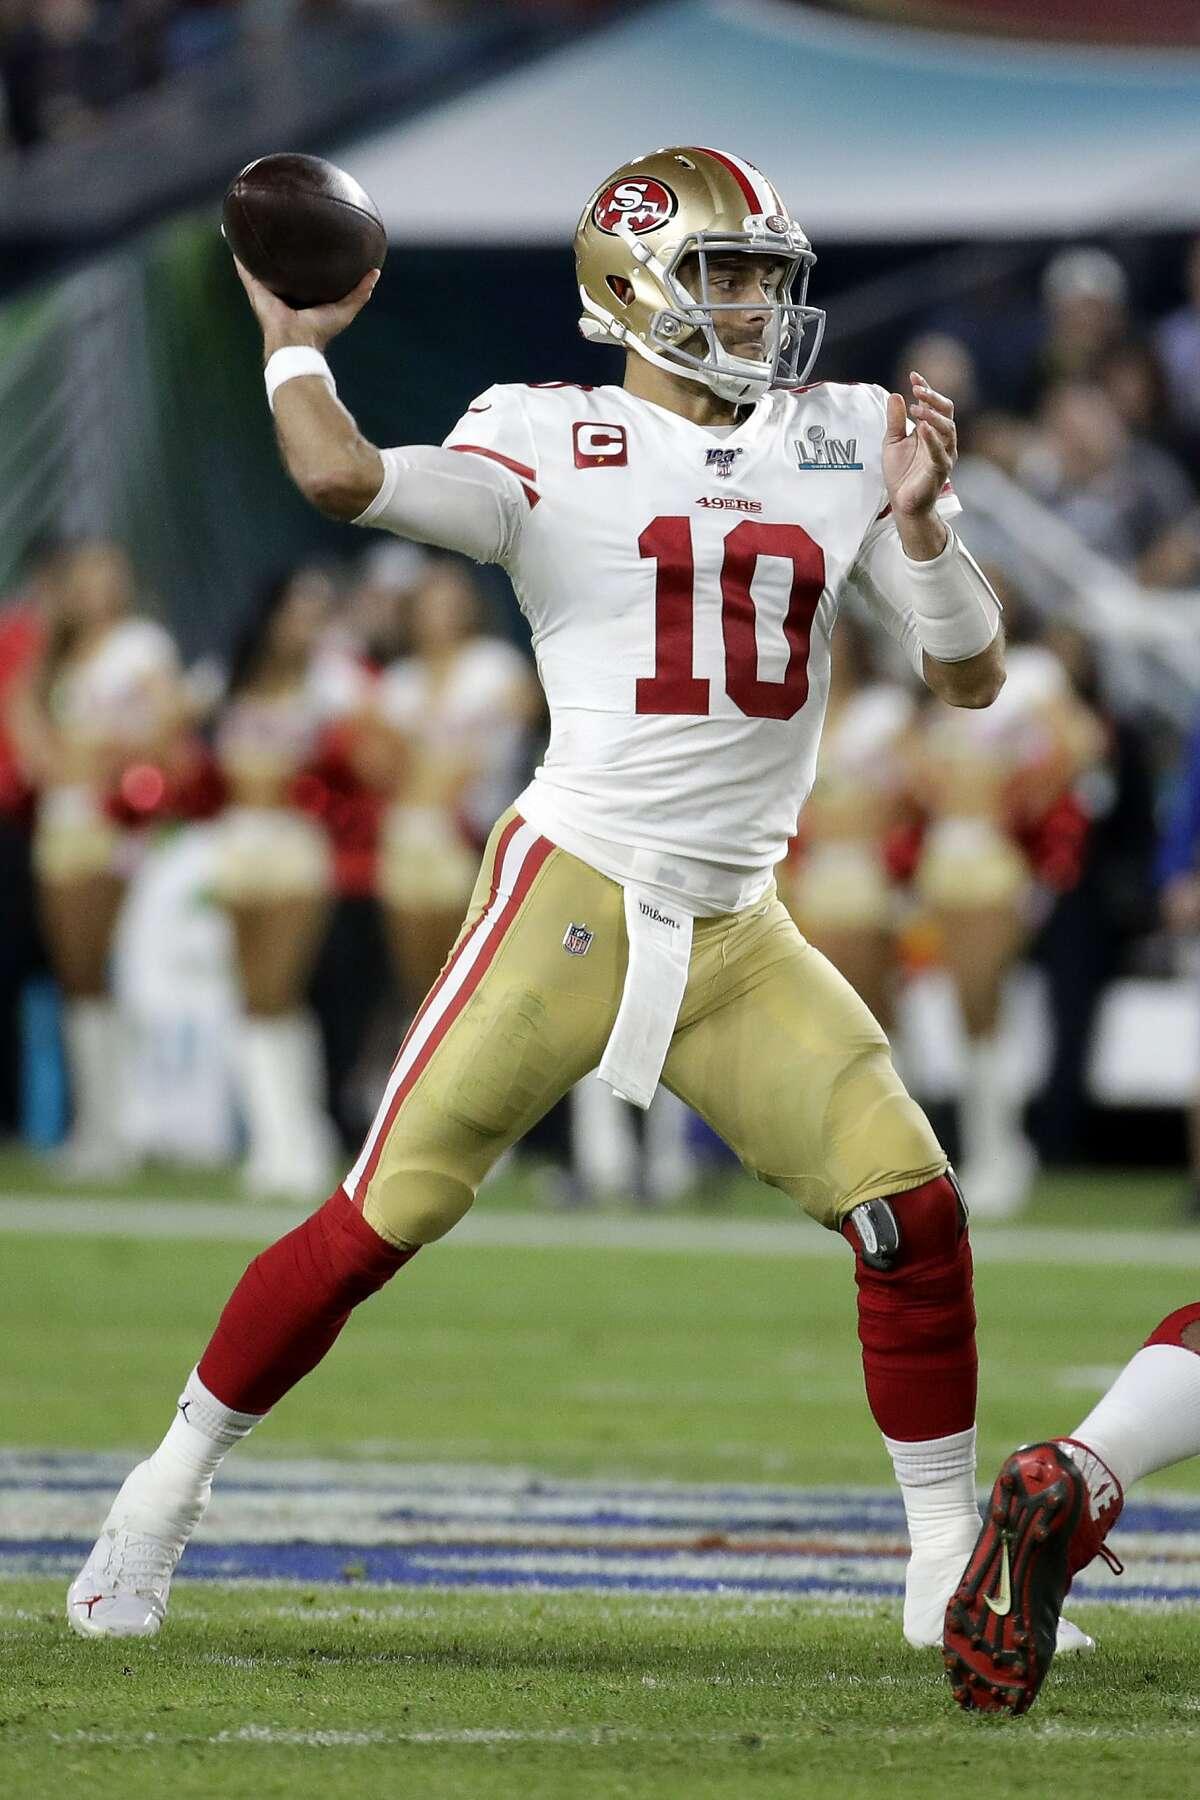 San Francisco 49ers quarterback Jimmy Garoppolo (10) works against the Kansas City Chiefs during the second half of the NFL Super Bowl 54 football game Sunday, Feb. 2, 2020, in Miami Gardens, Fla. (AP Photo/Patrick Semansky)